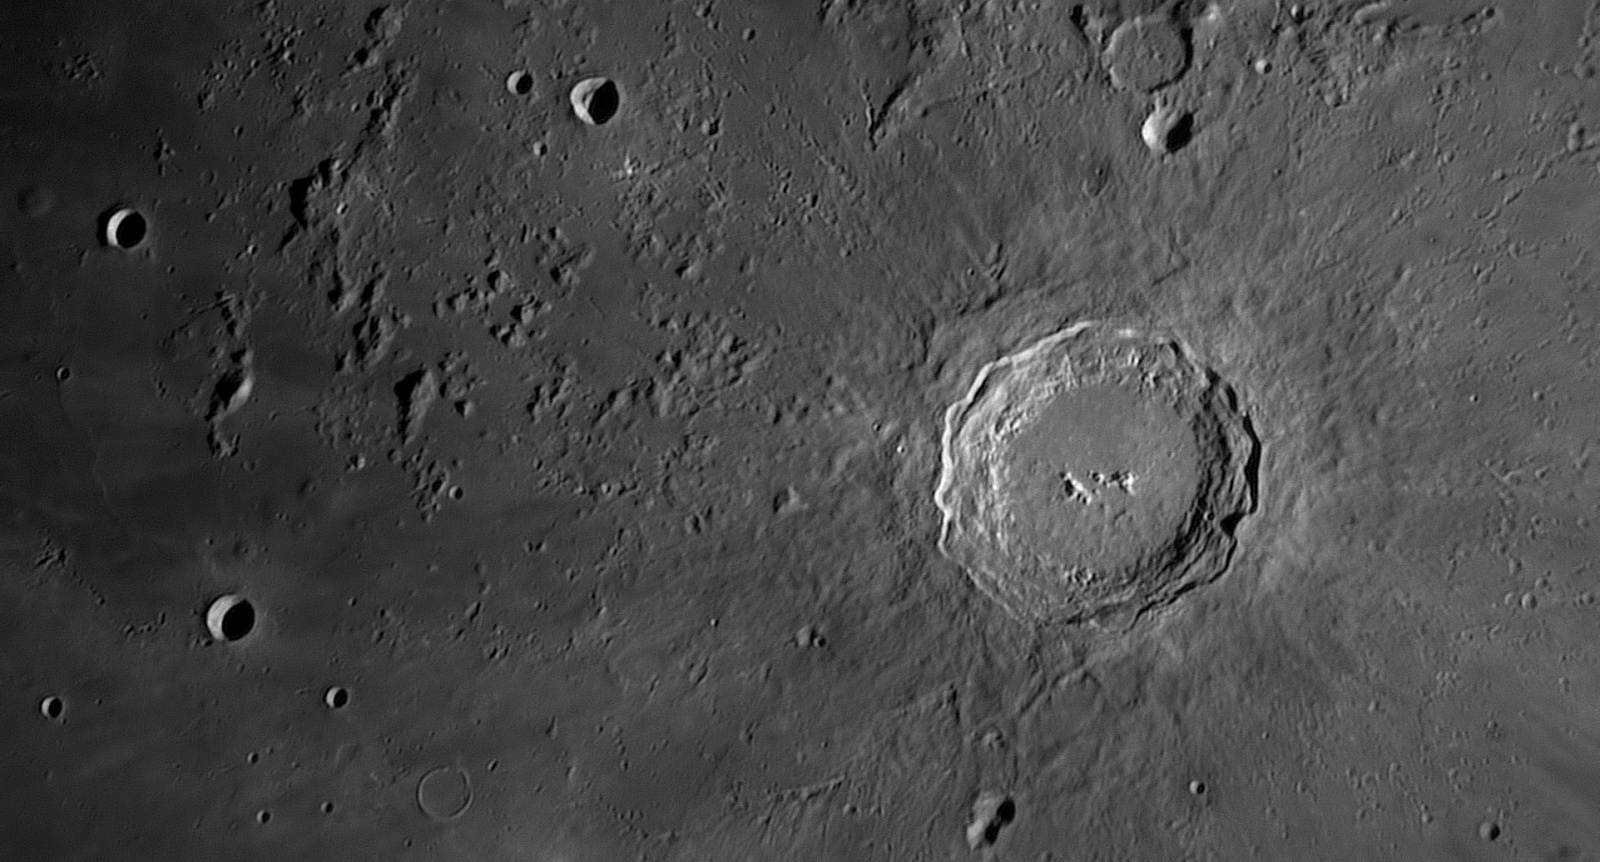 Copernicus_2021-04-23T00_38_10_R.thumb.jpg.6ff711c49af25908c40e3c962a8f3427.jpg